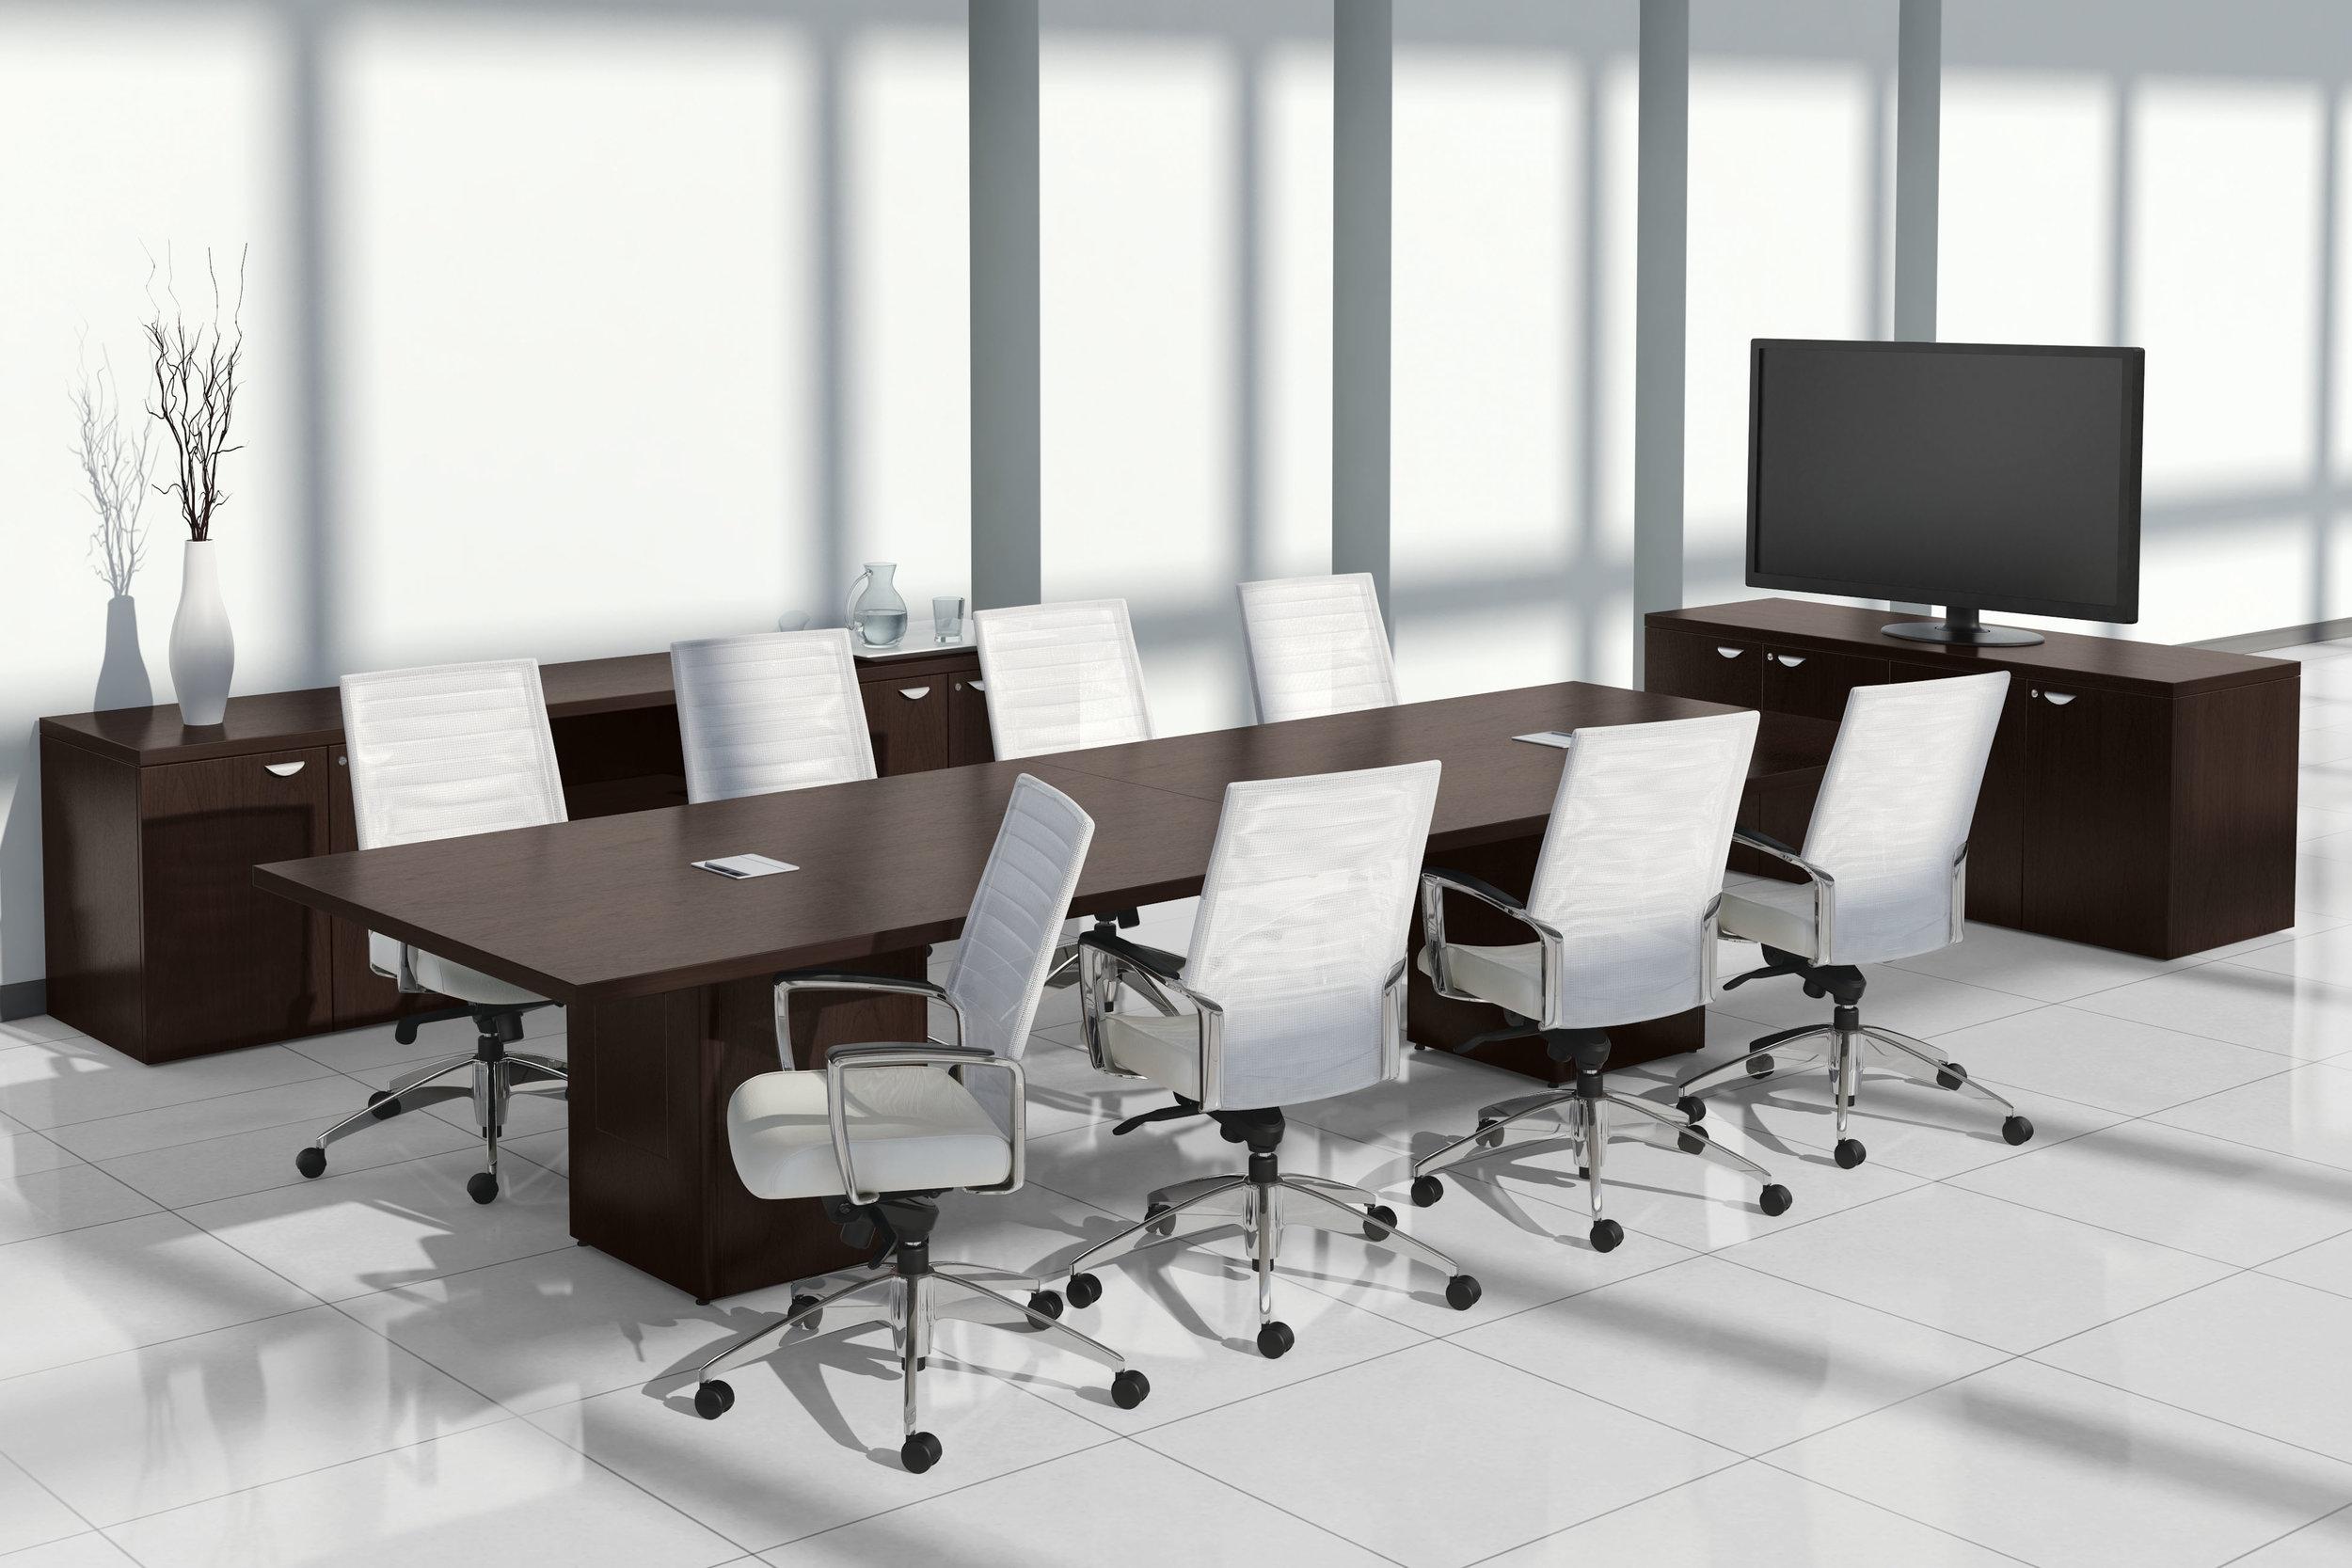 DFR_Lufton_Boardroom_Global_Accord_3900x2600.jpg